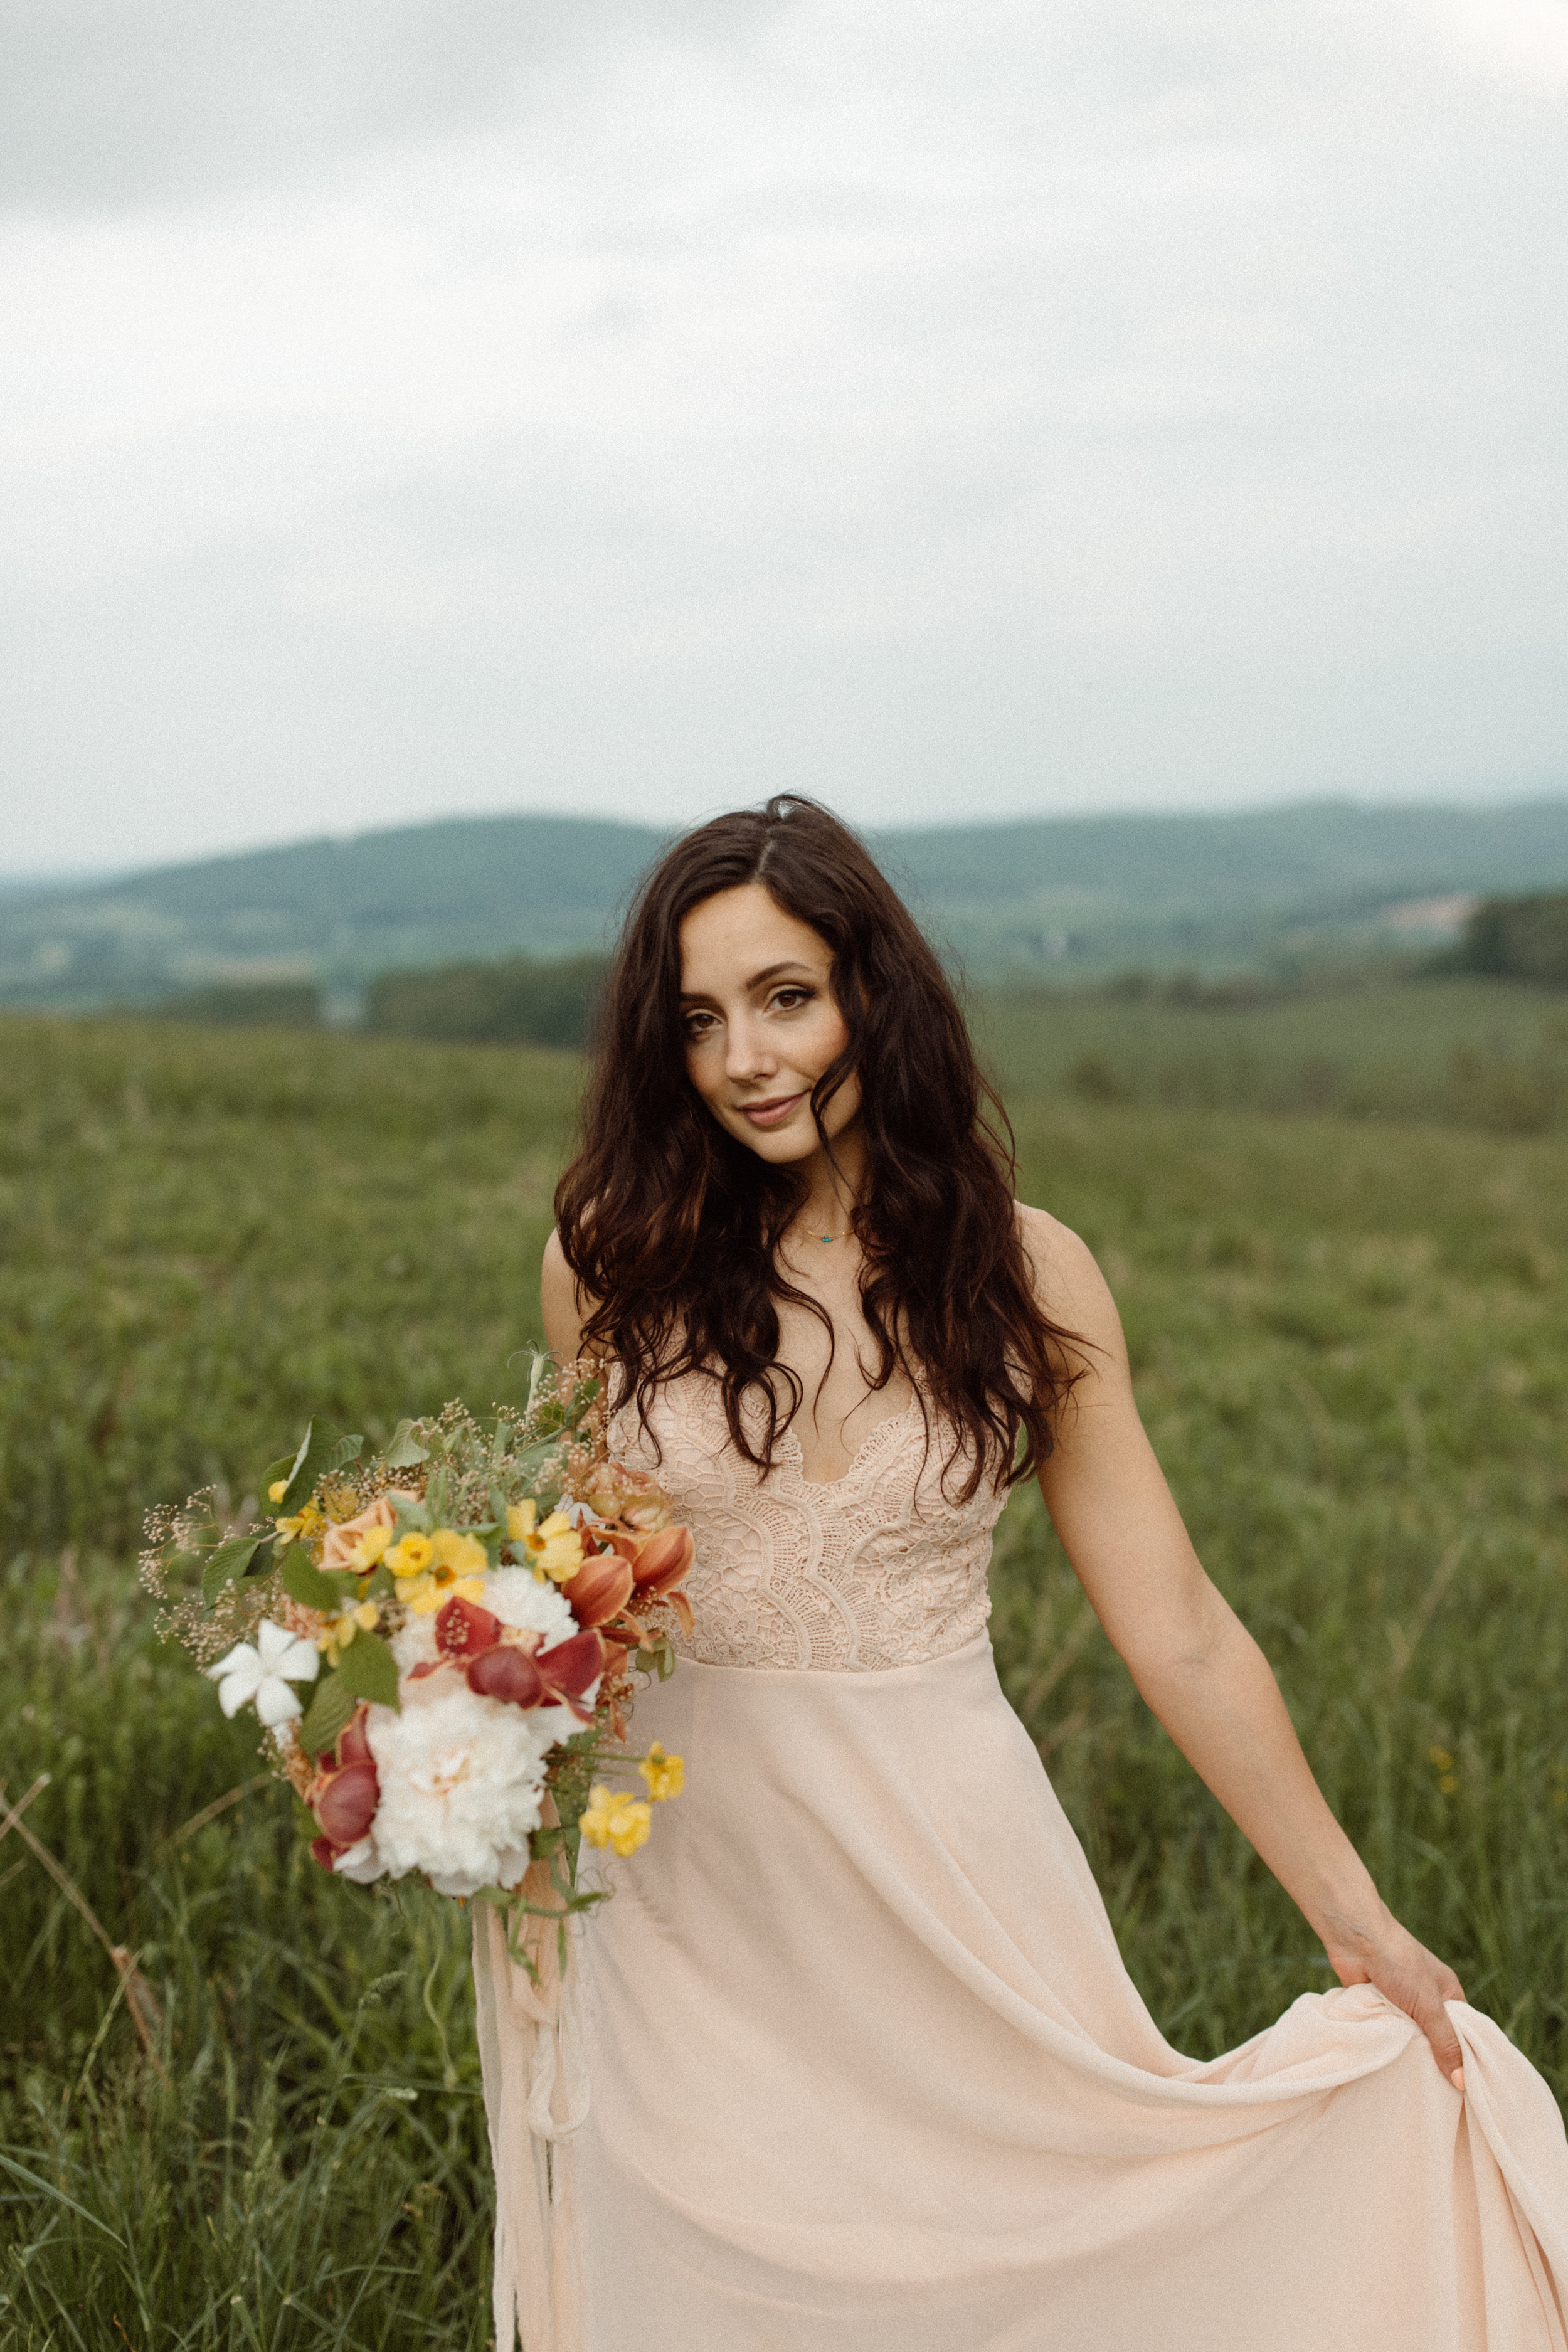 kelsey&mark-engagement-skymeadows-2019-peytoncurry-9463.jpg